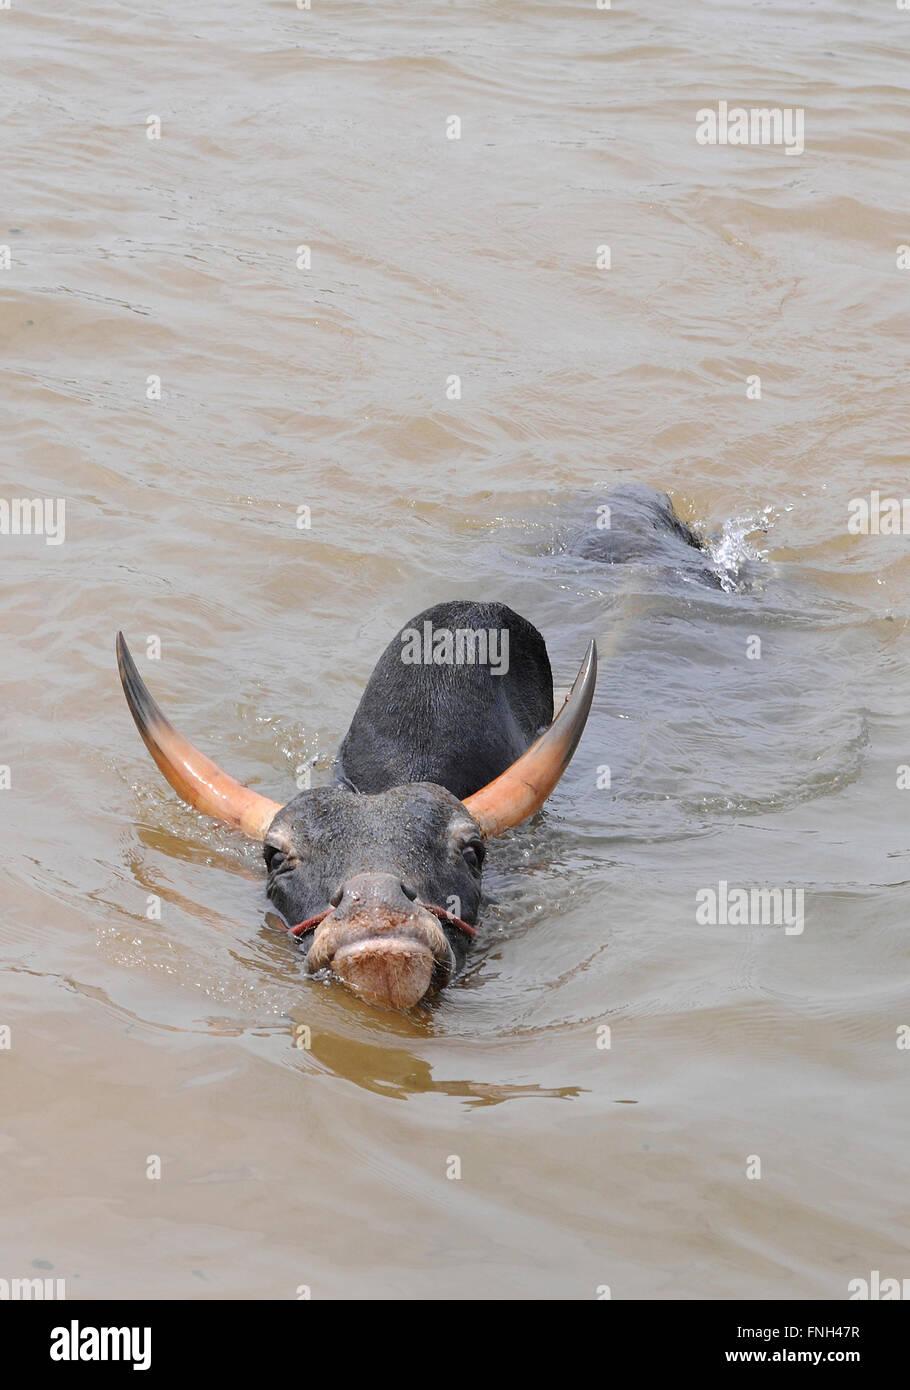 Jallikattu bull practice swimming as its strengthens its skill to attack the bull tamer with its hind legs,Madurai,Tamilnadu,TN - Stock Image